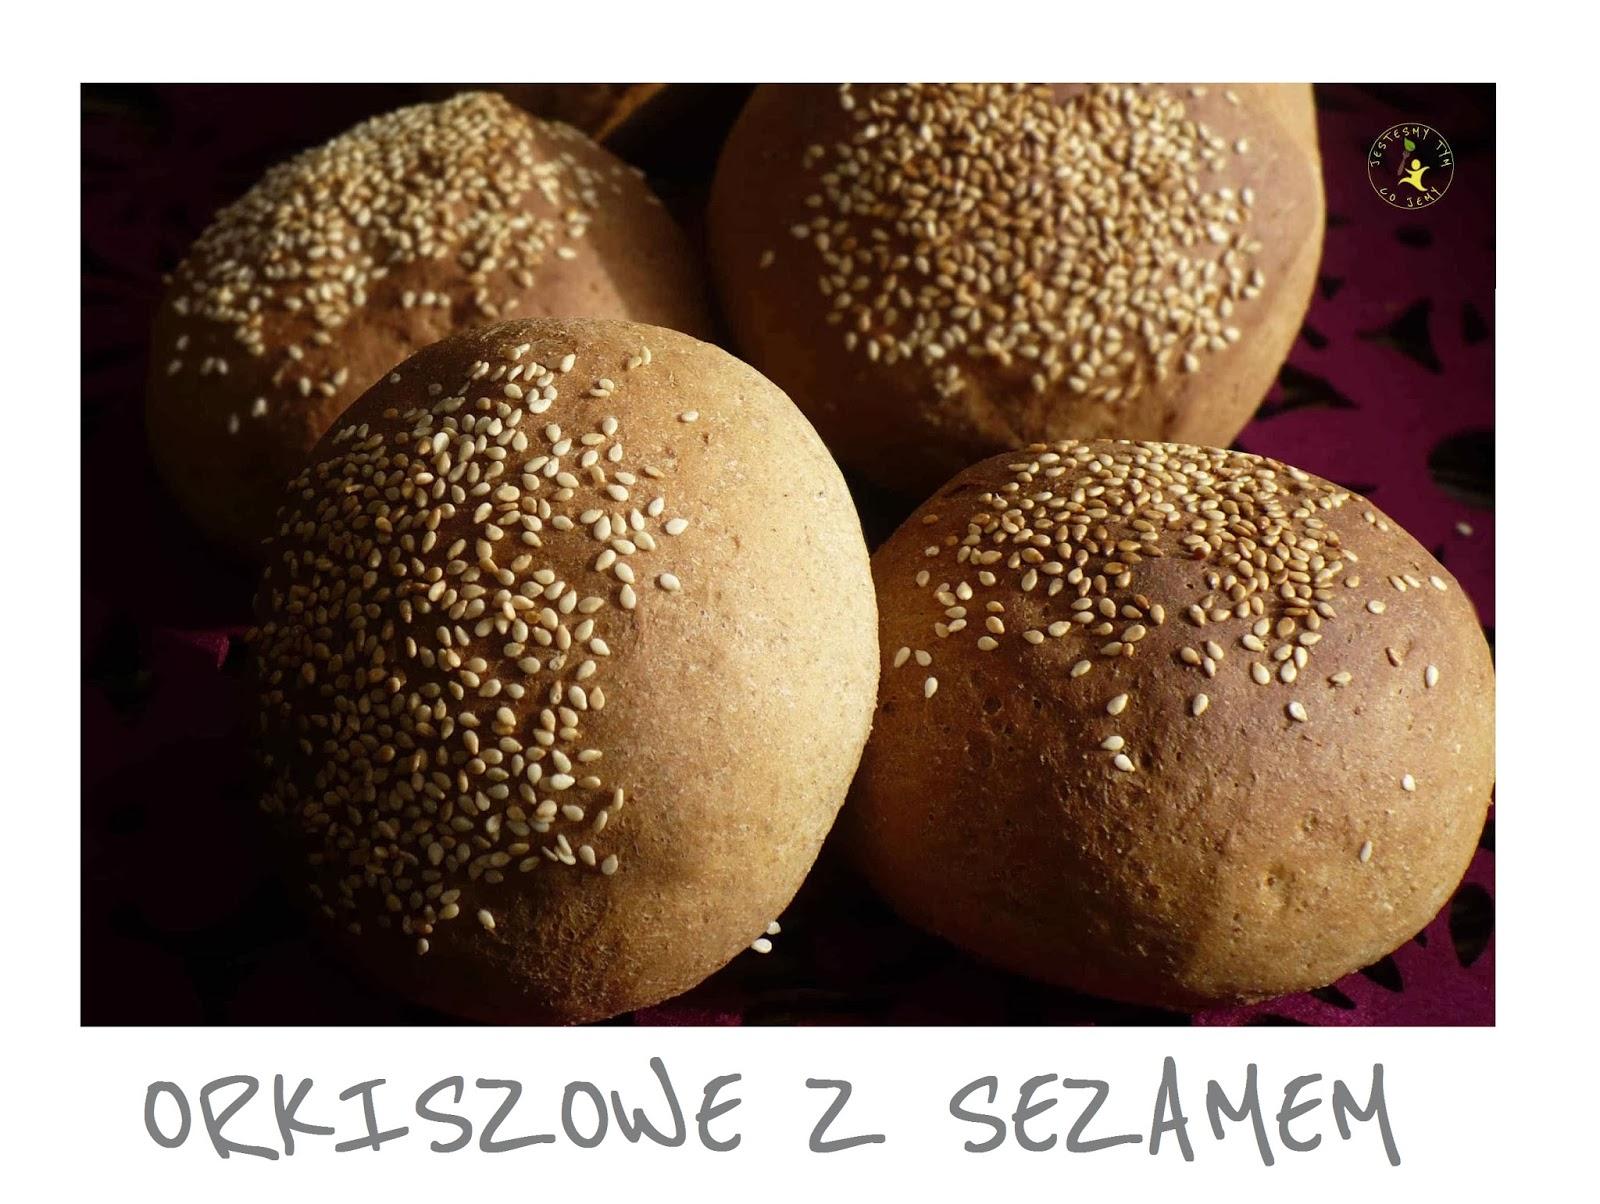 http://jestesmytymcojemy.blogspot.com/2014/02/puszyste-orkiszowe-buki-penoziarniste.html